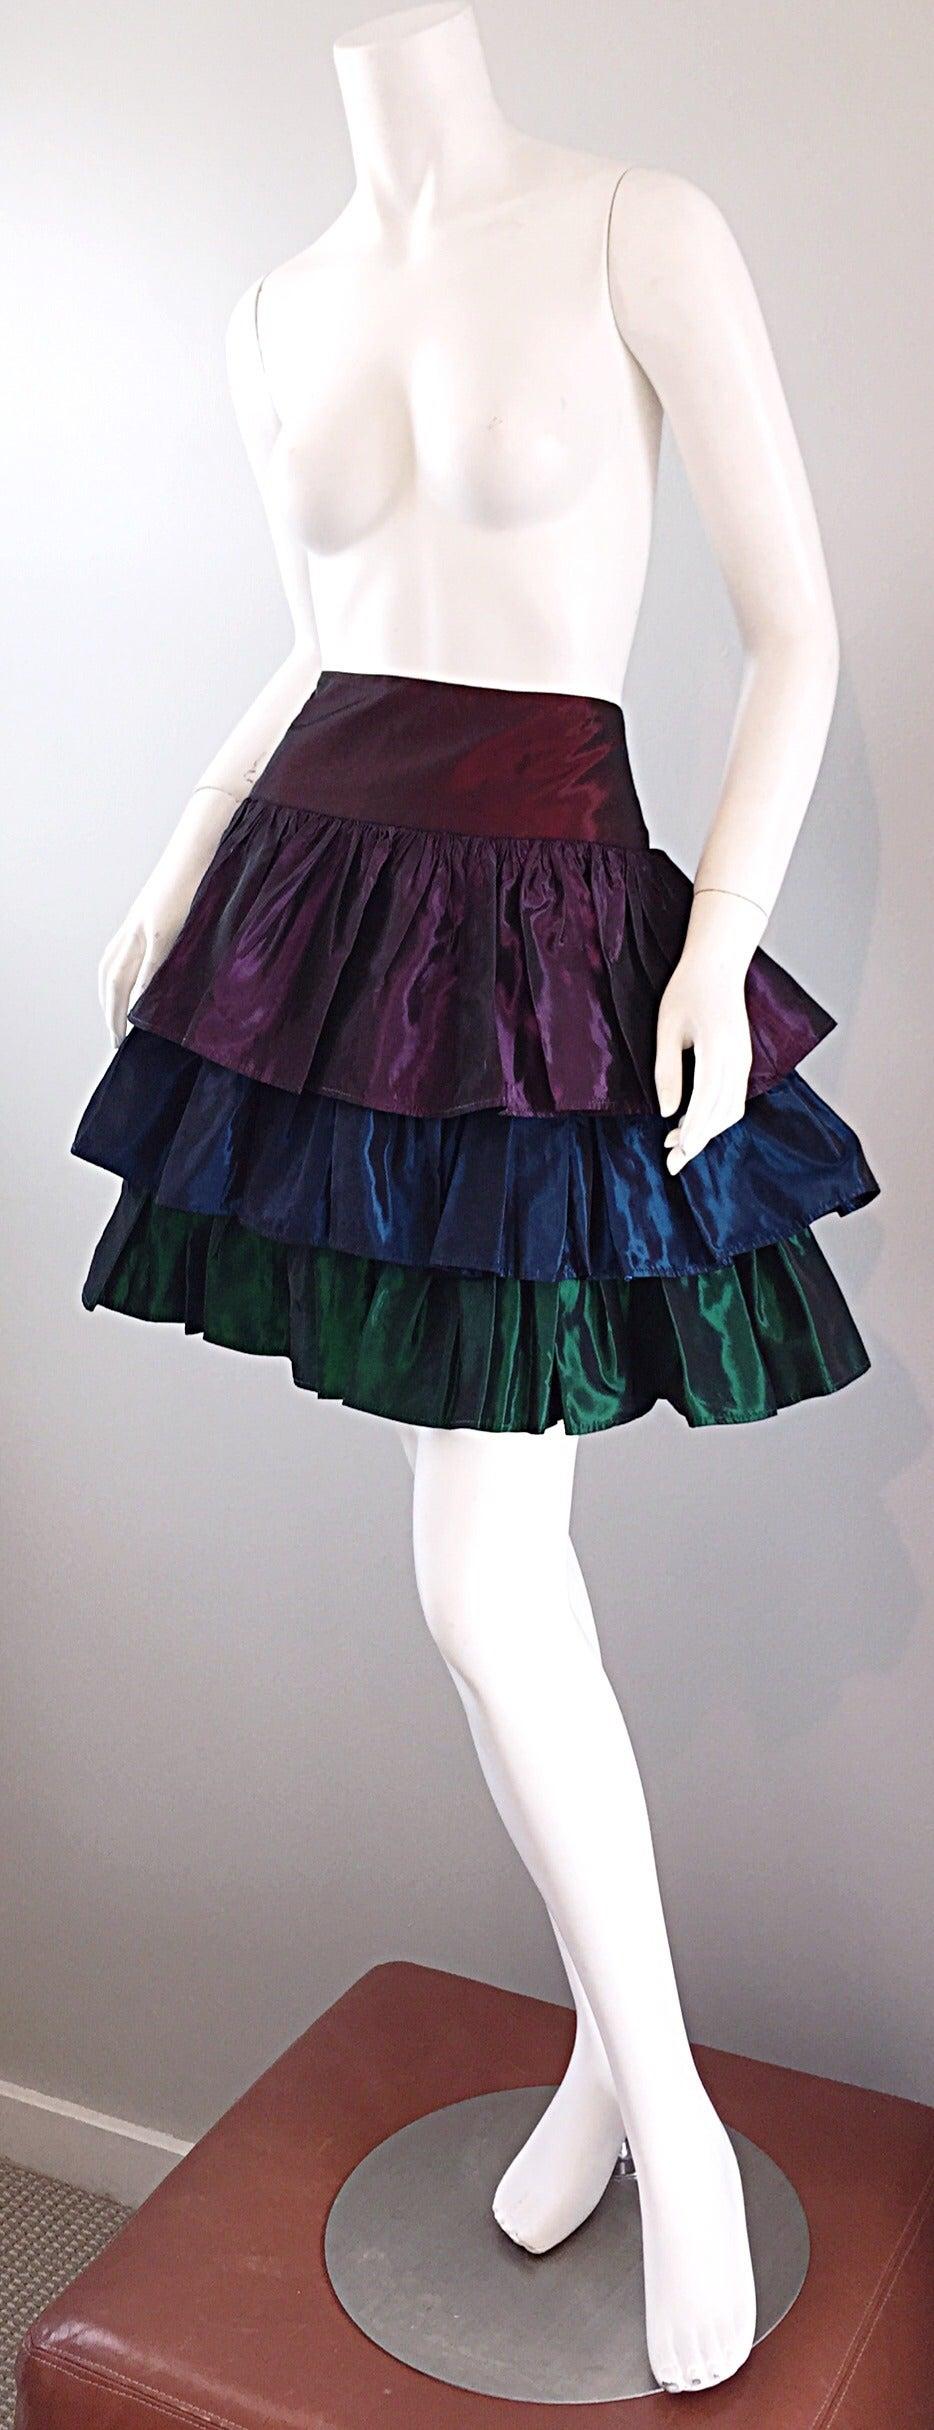 Kalinka For Bergdorf Goodman Tiered Taffeta ' Rainbow ' Vintage Skirt 6